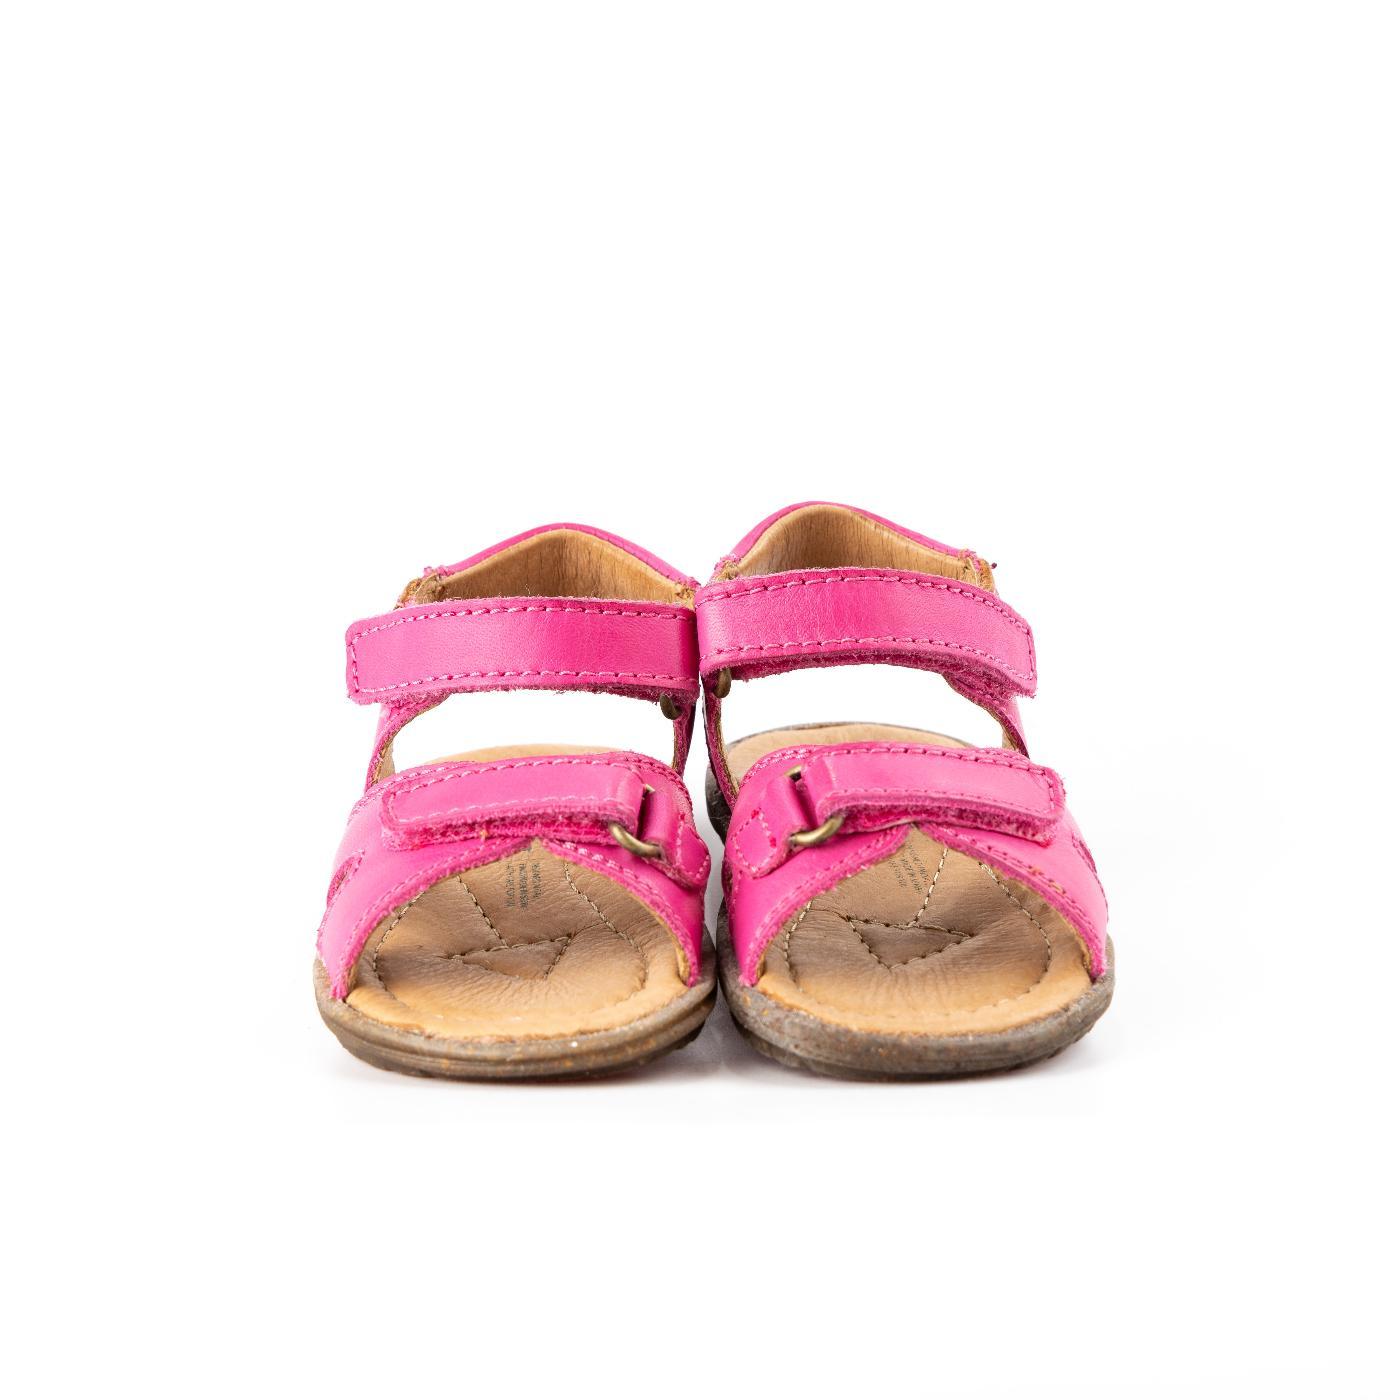 Fushia Sandals